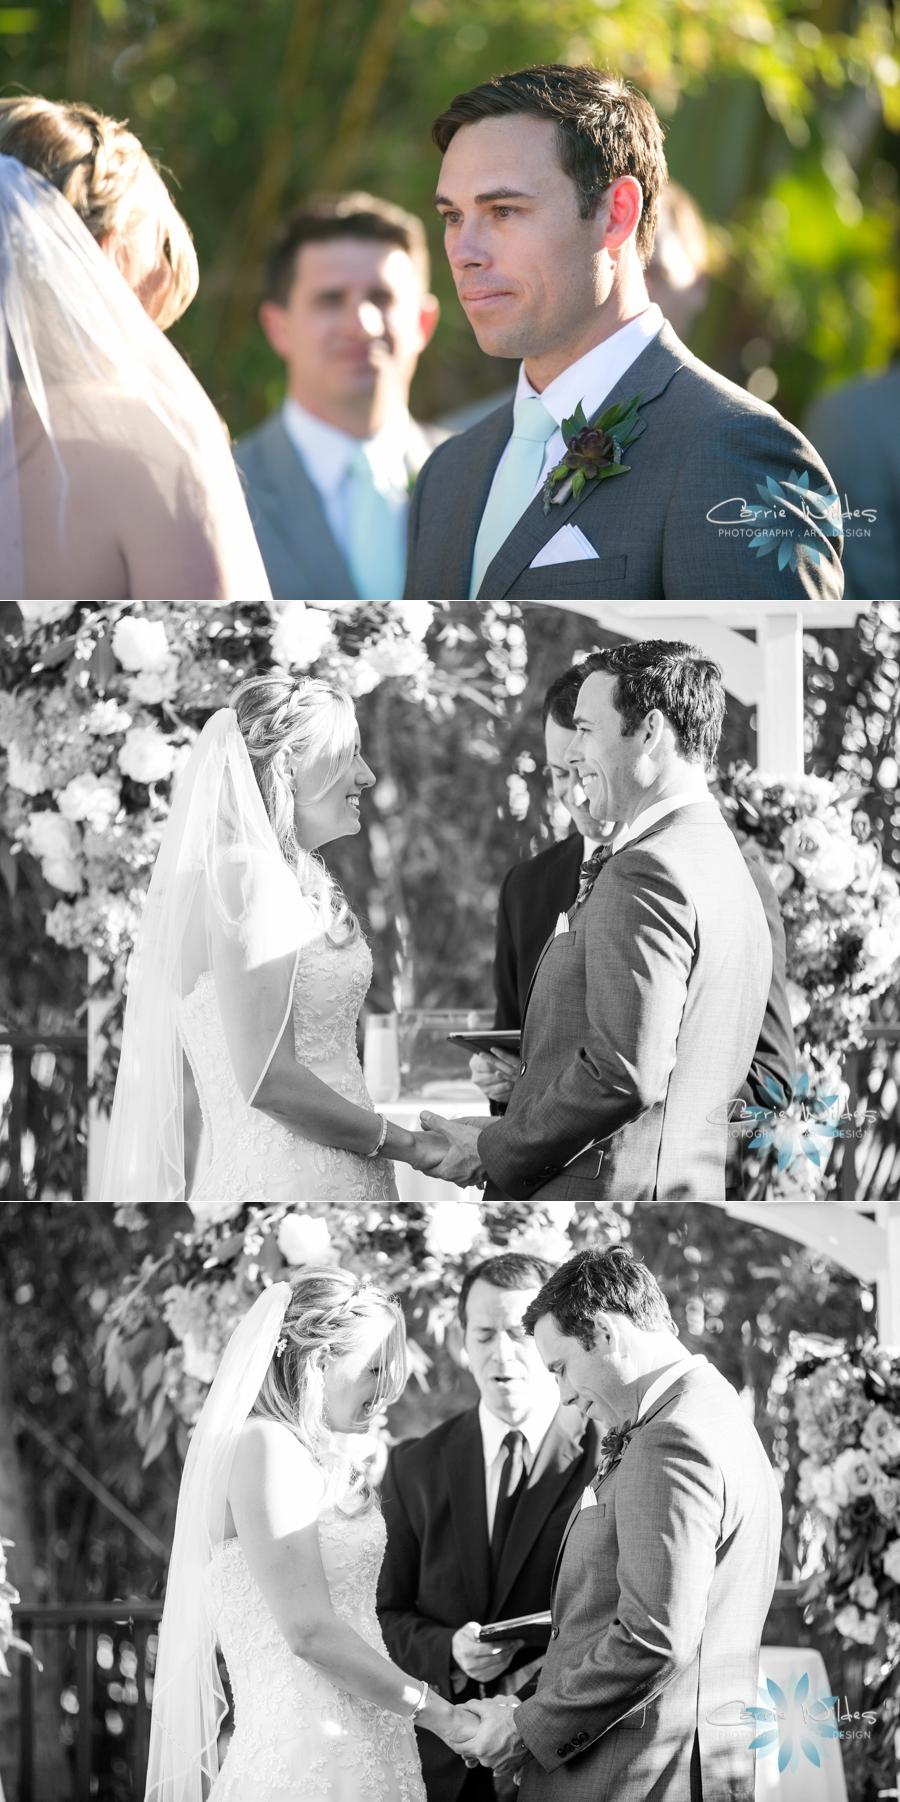 3_24_18 Kristin and Daniel Hotel Zamora Wedding_0035.jpg